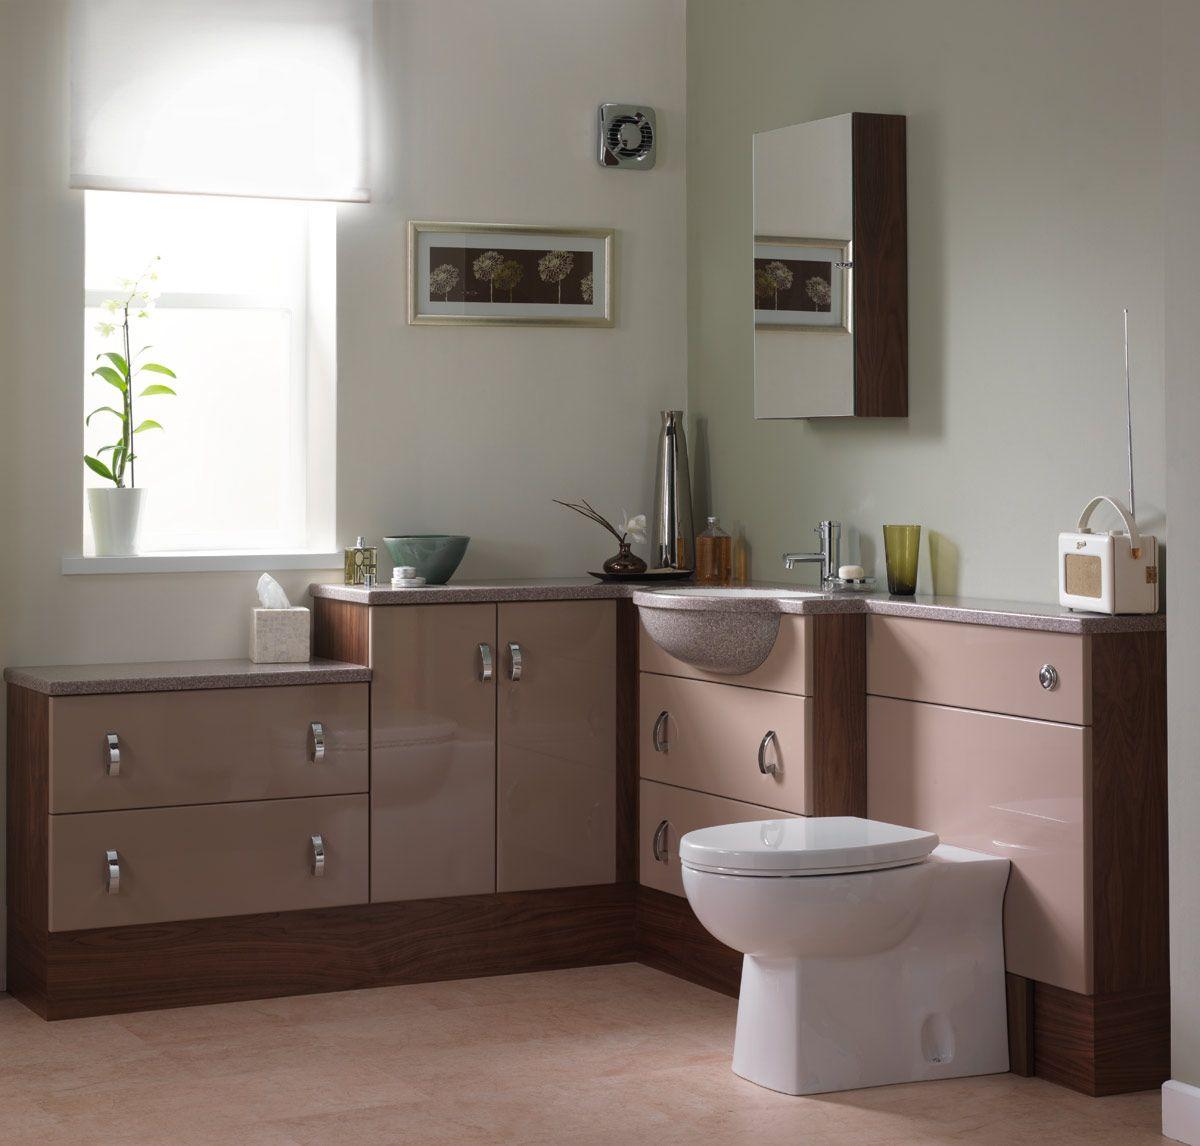 Vanity Hall Bathroom Units vanity hall ultra cappuccino gloss furniture | vanity hall